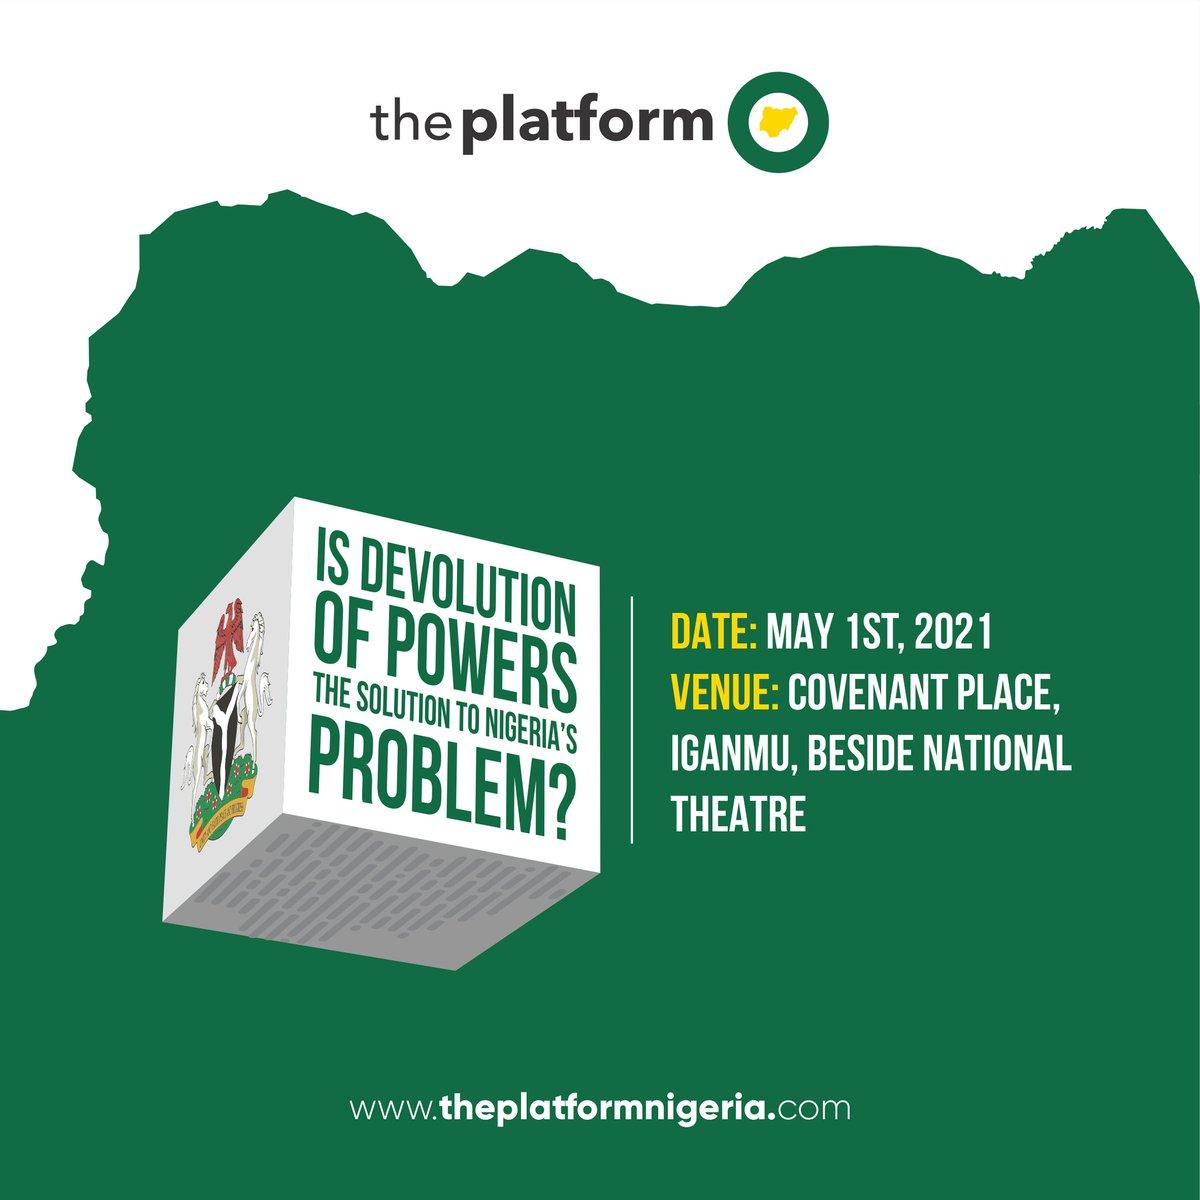 The Platform Nigeria Blog